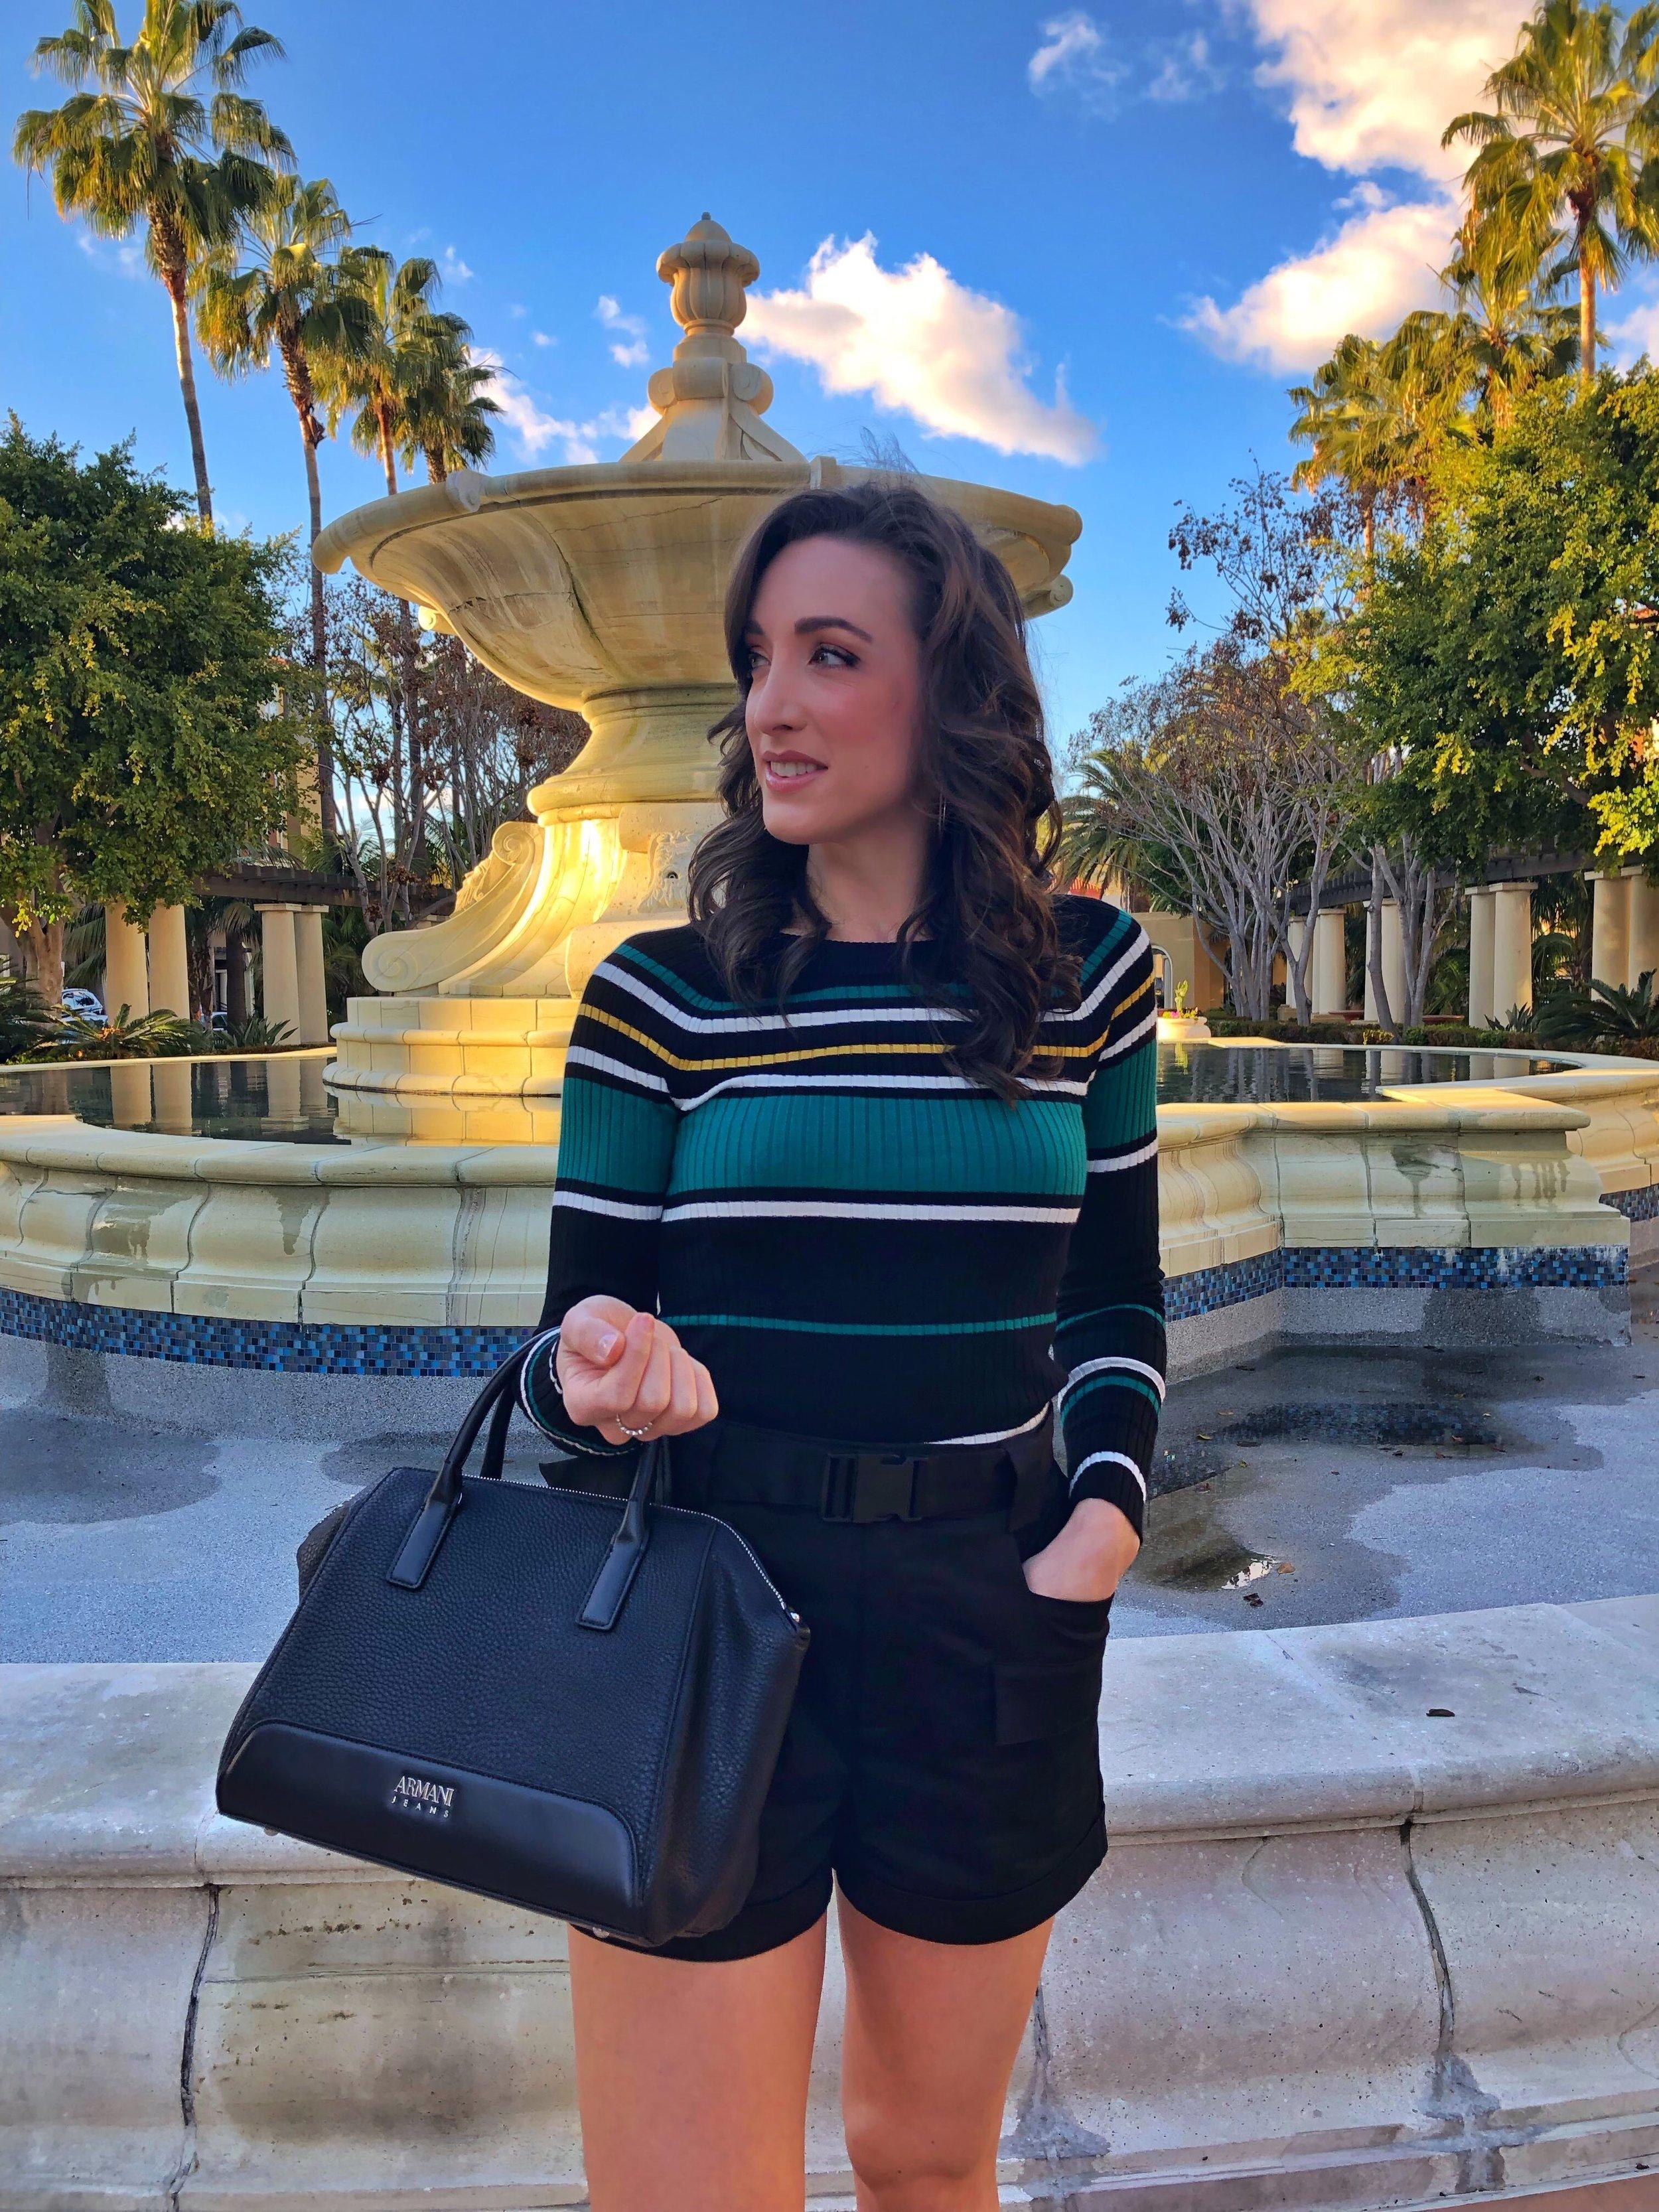 Olivia Culpo Express High Waisted Cargo Shorts. Black Leather Armani Tote. Beautiful San Diego day.